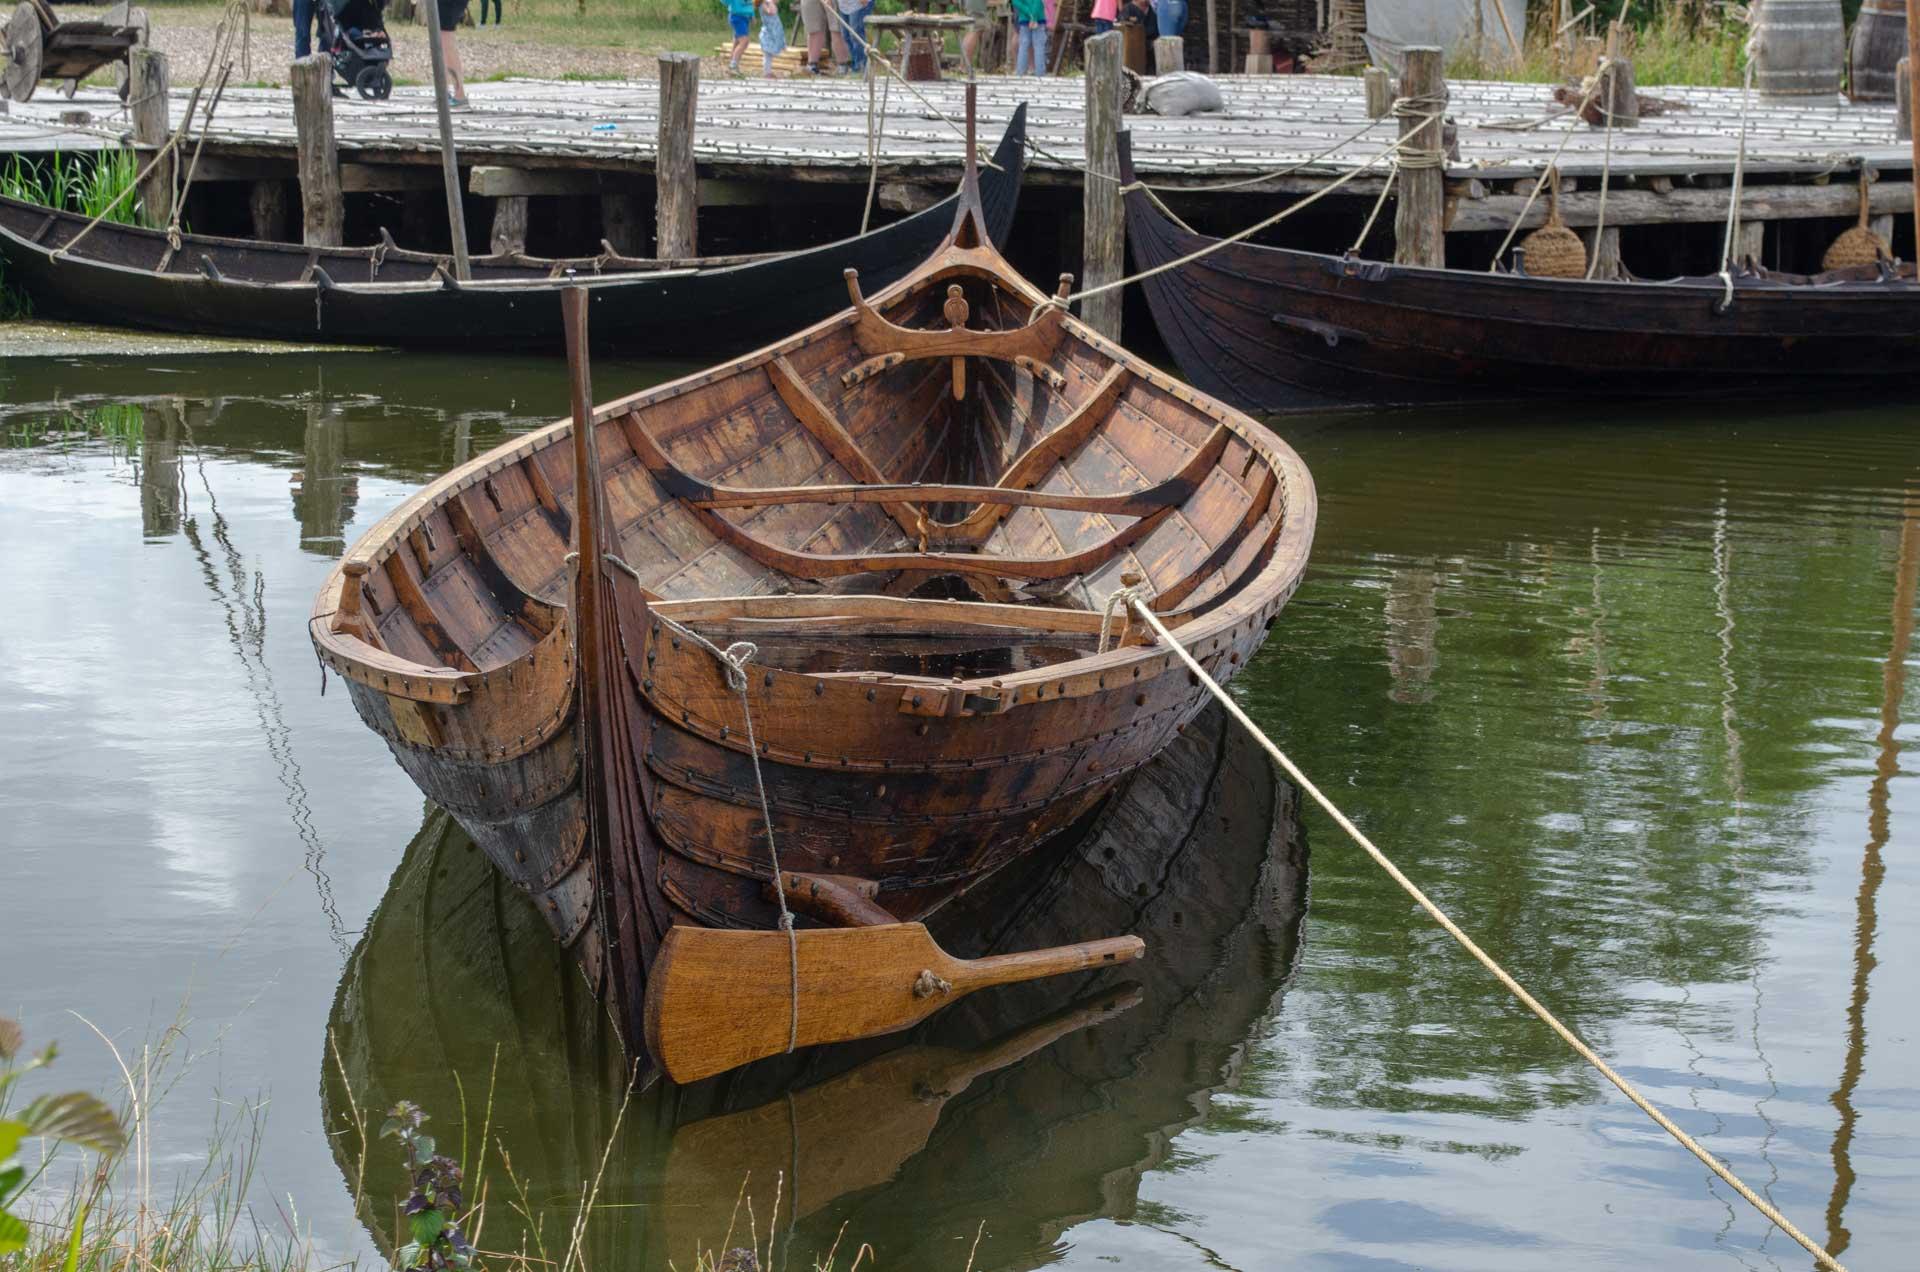 Vikingercenter Ribe © Pfotentour